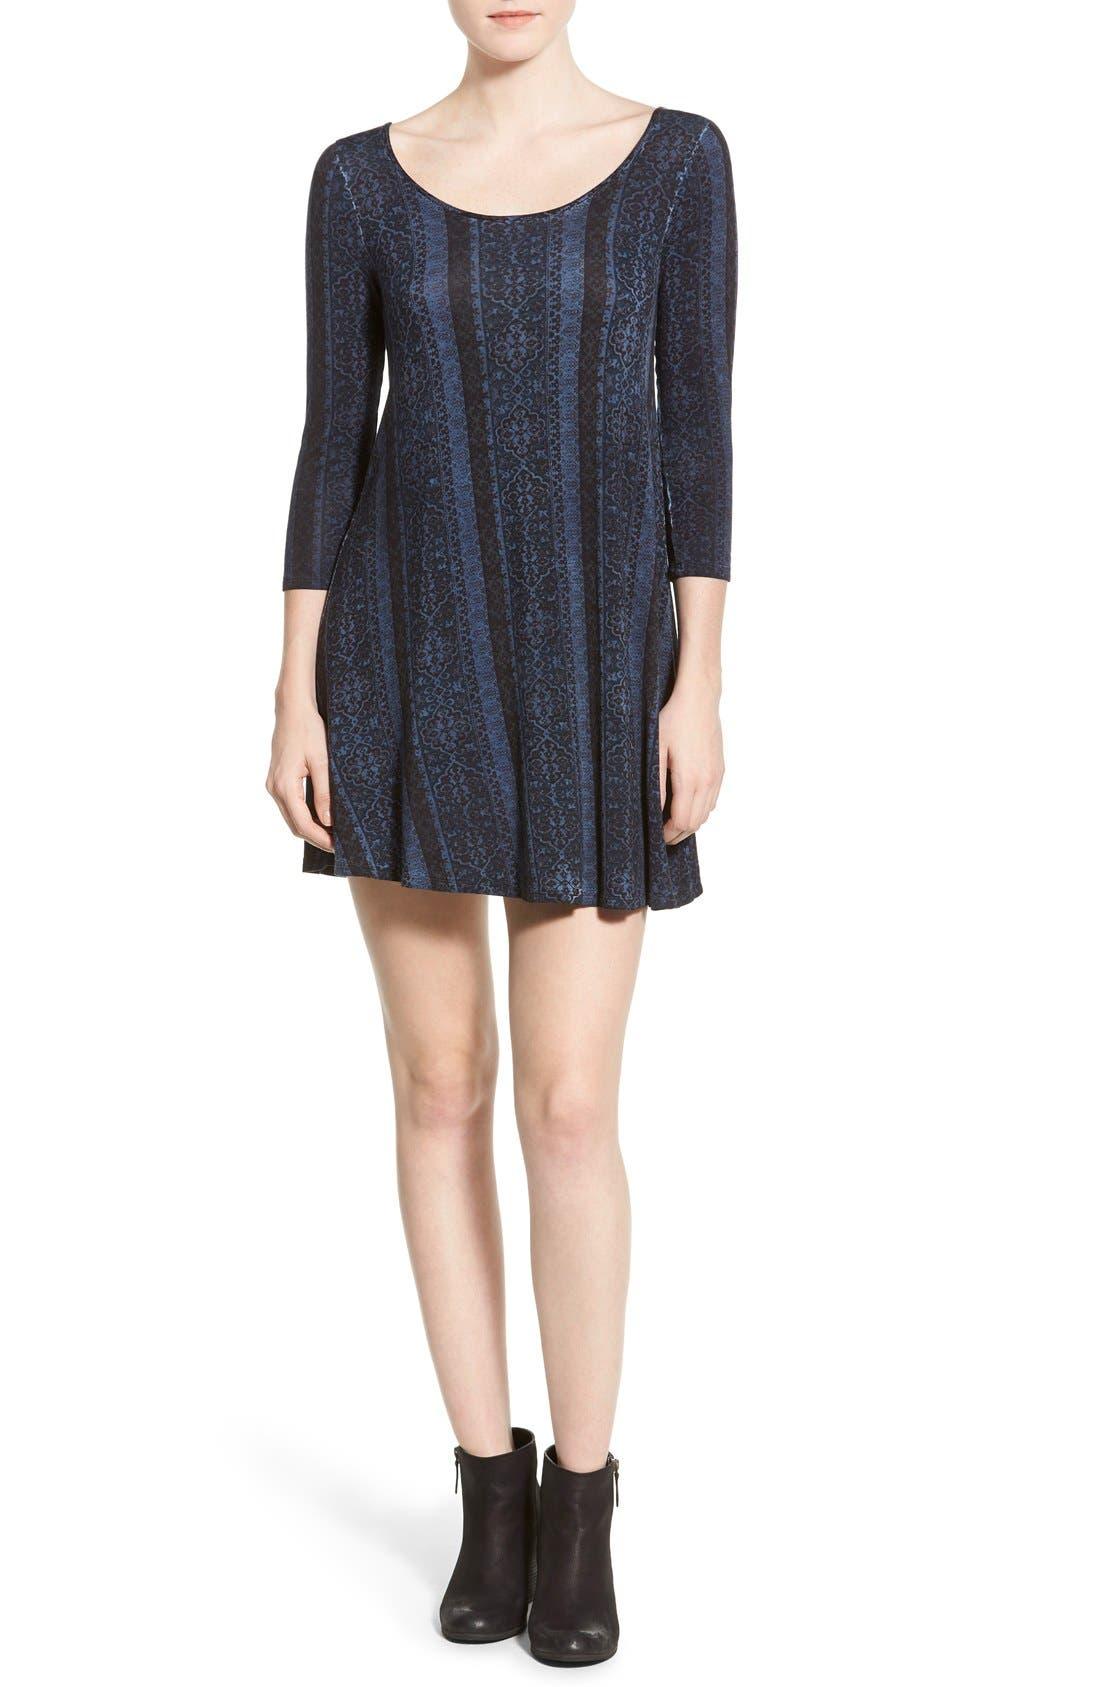 Main Image - Socialite Print Cross Back Knit Dress